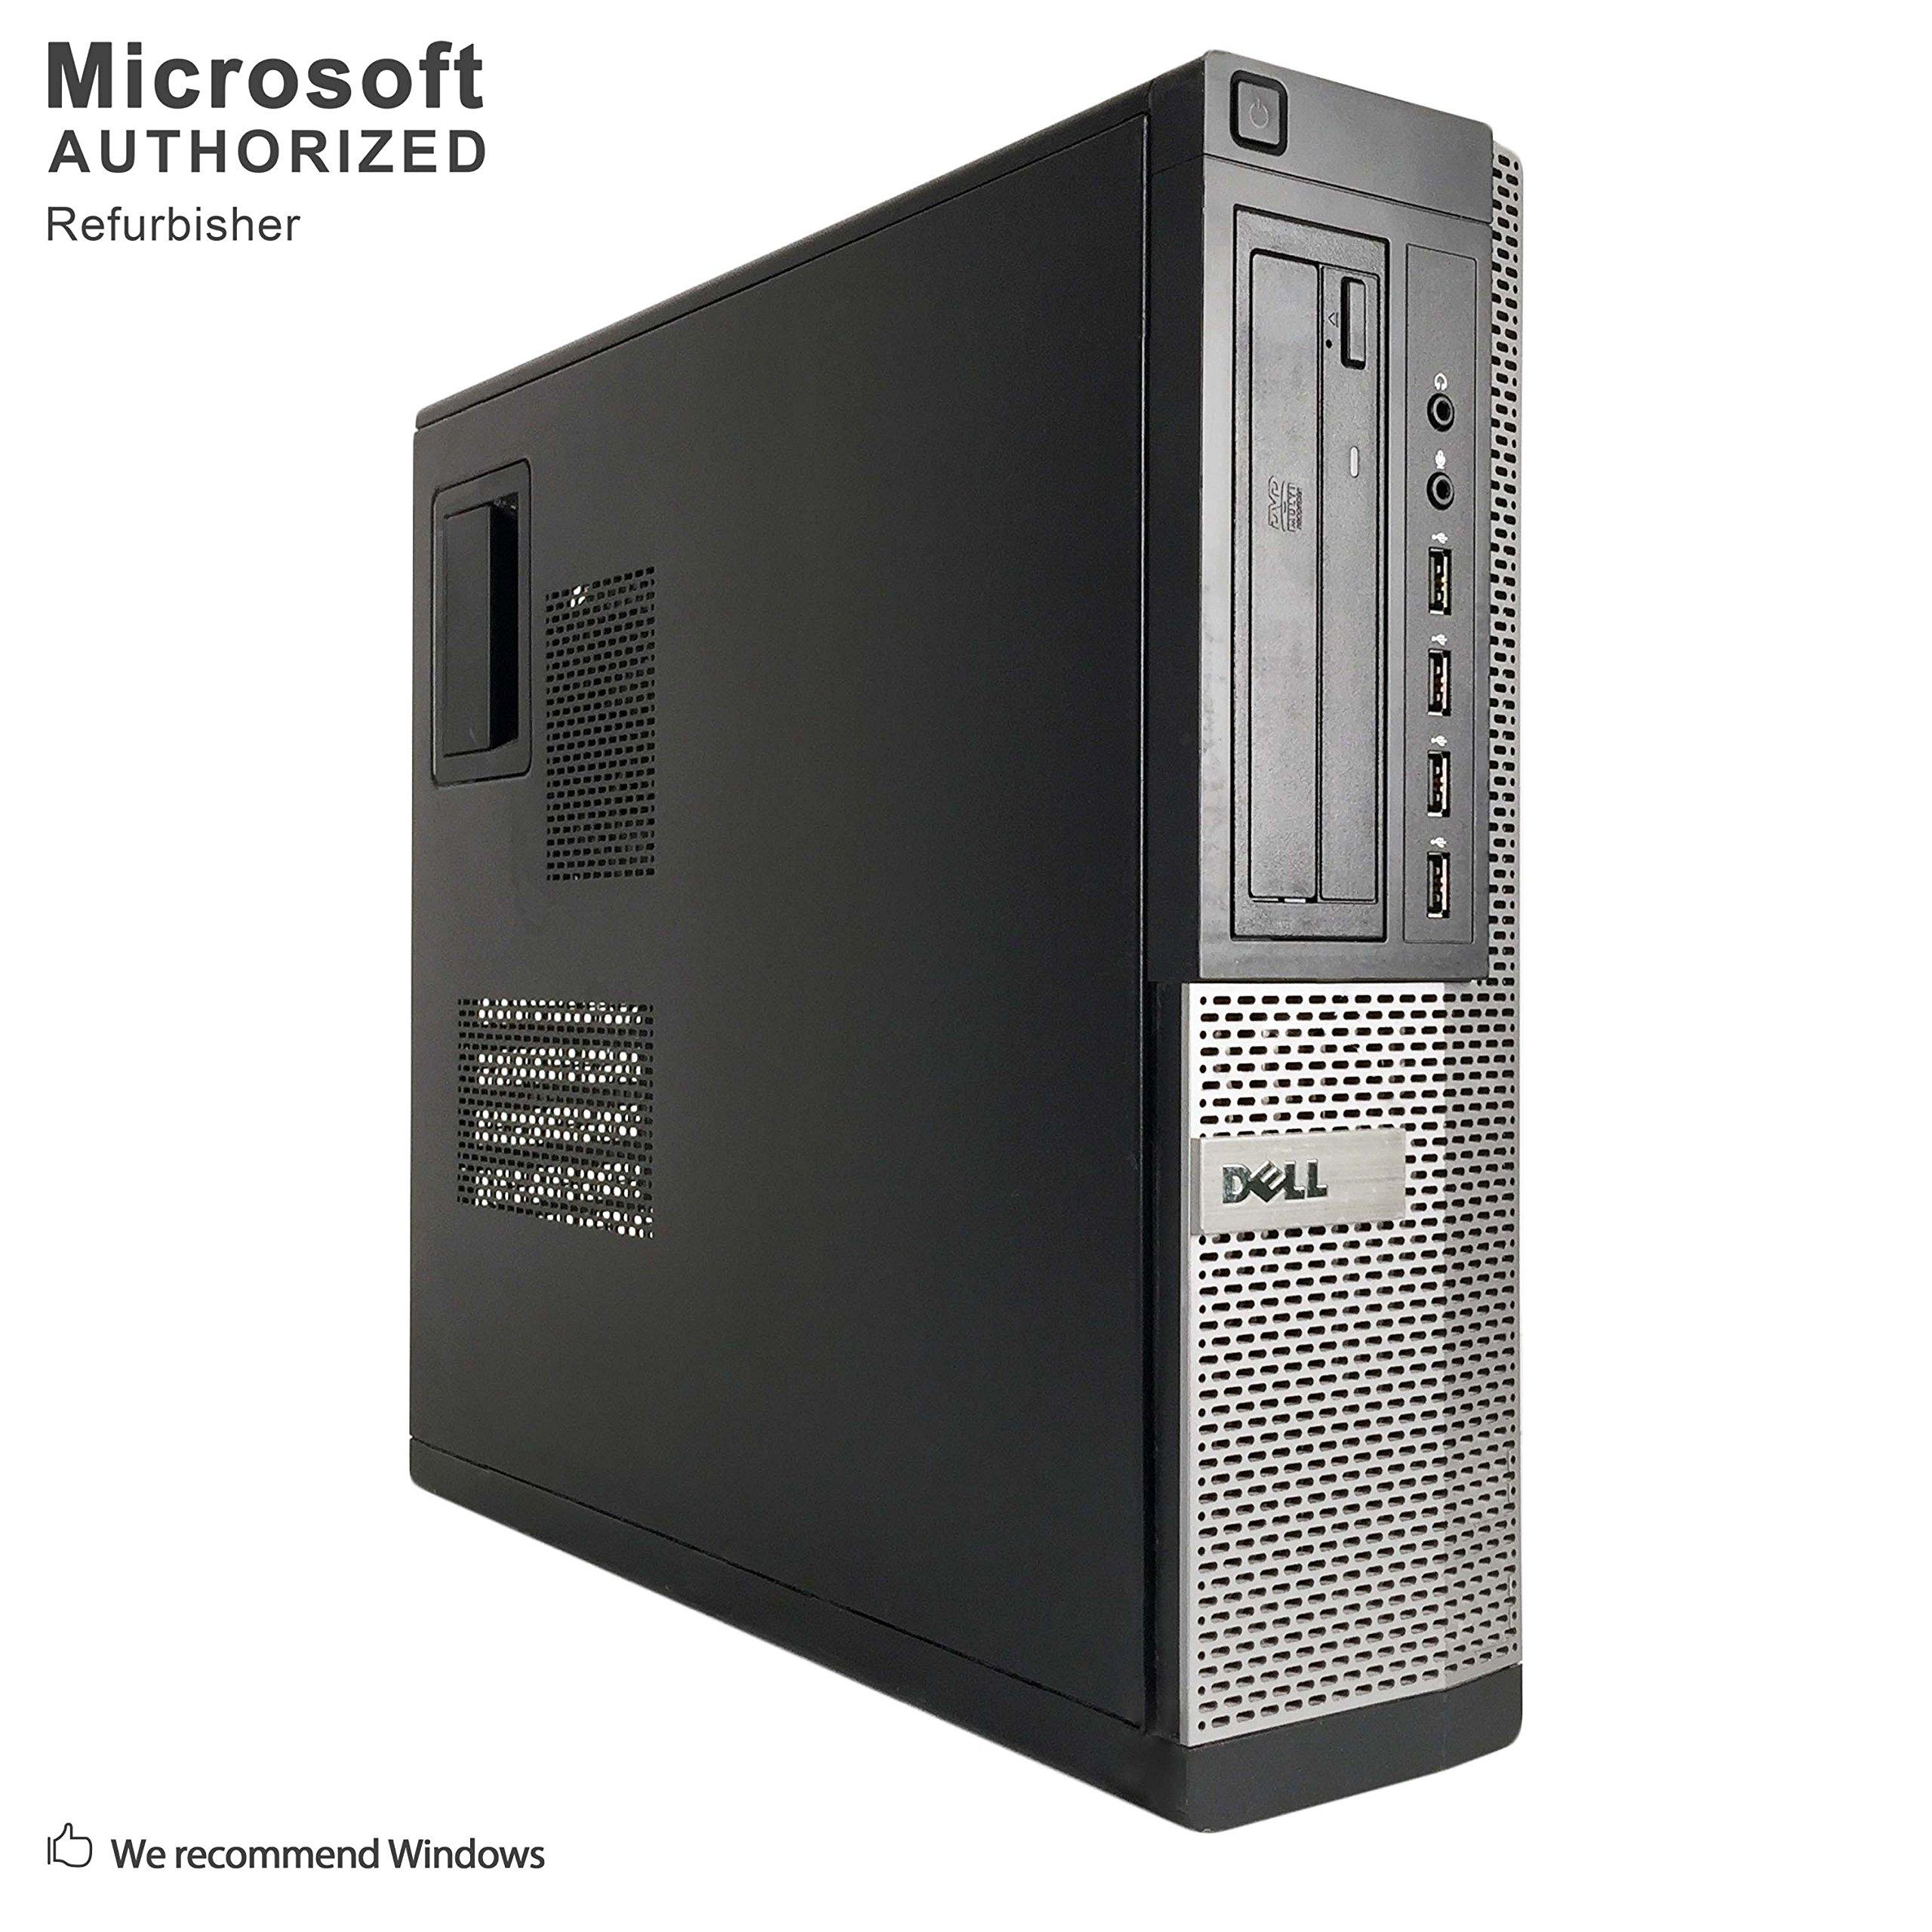 Dell Optiplex 990 Desktop Computer, i7 upto 3.8GHz CPU, 16GB DDR3 Memory, New 512GB SSD, WiFi, Windows 10 Pro (Renewed) by Dell